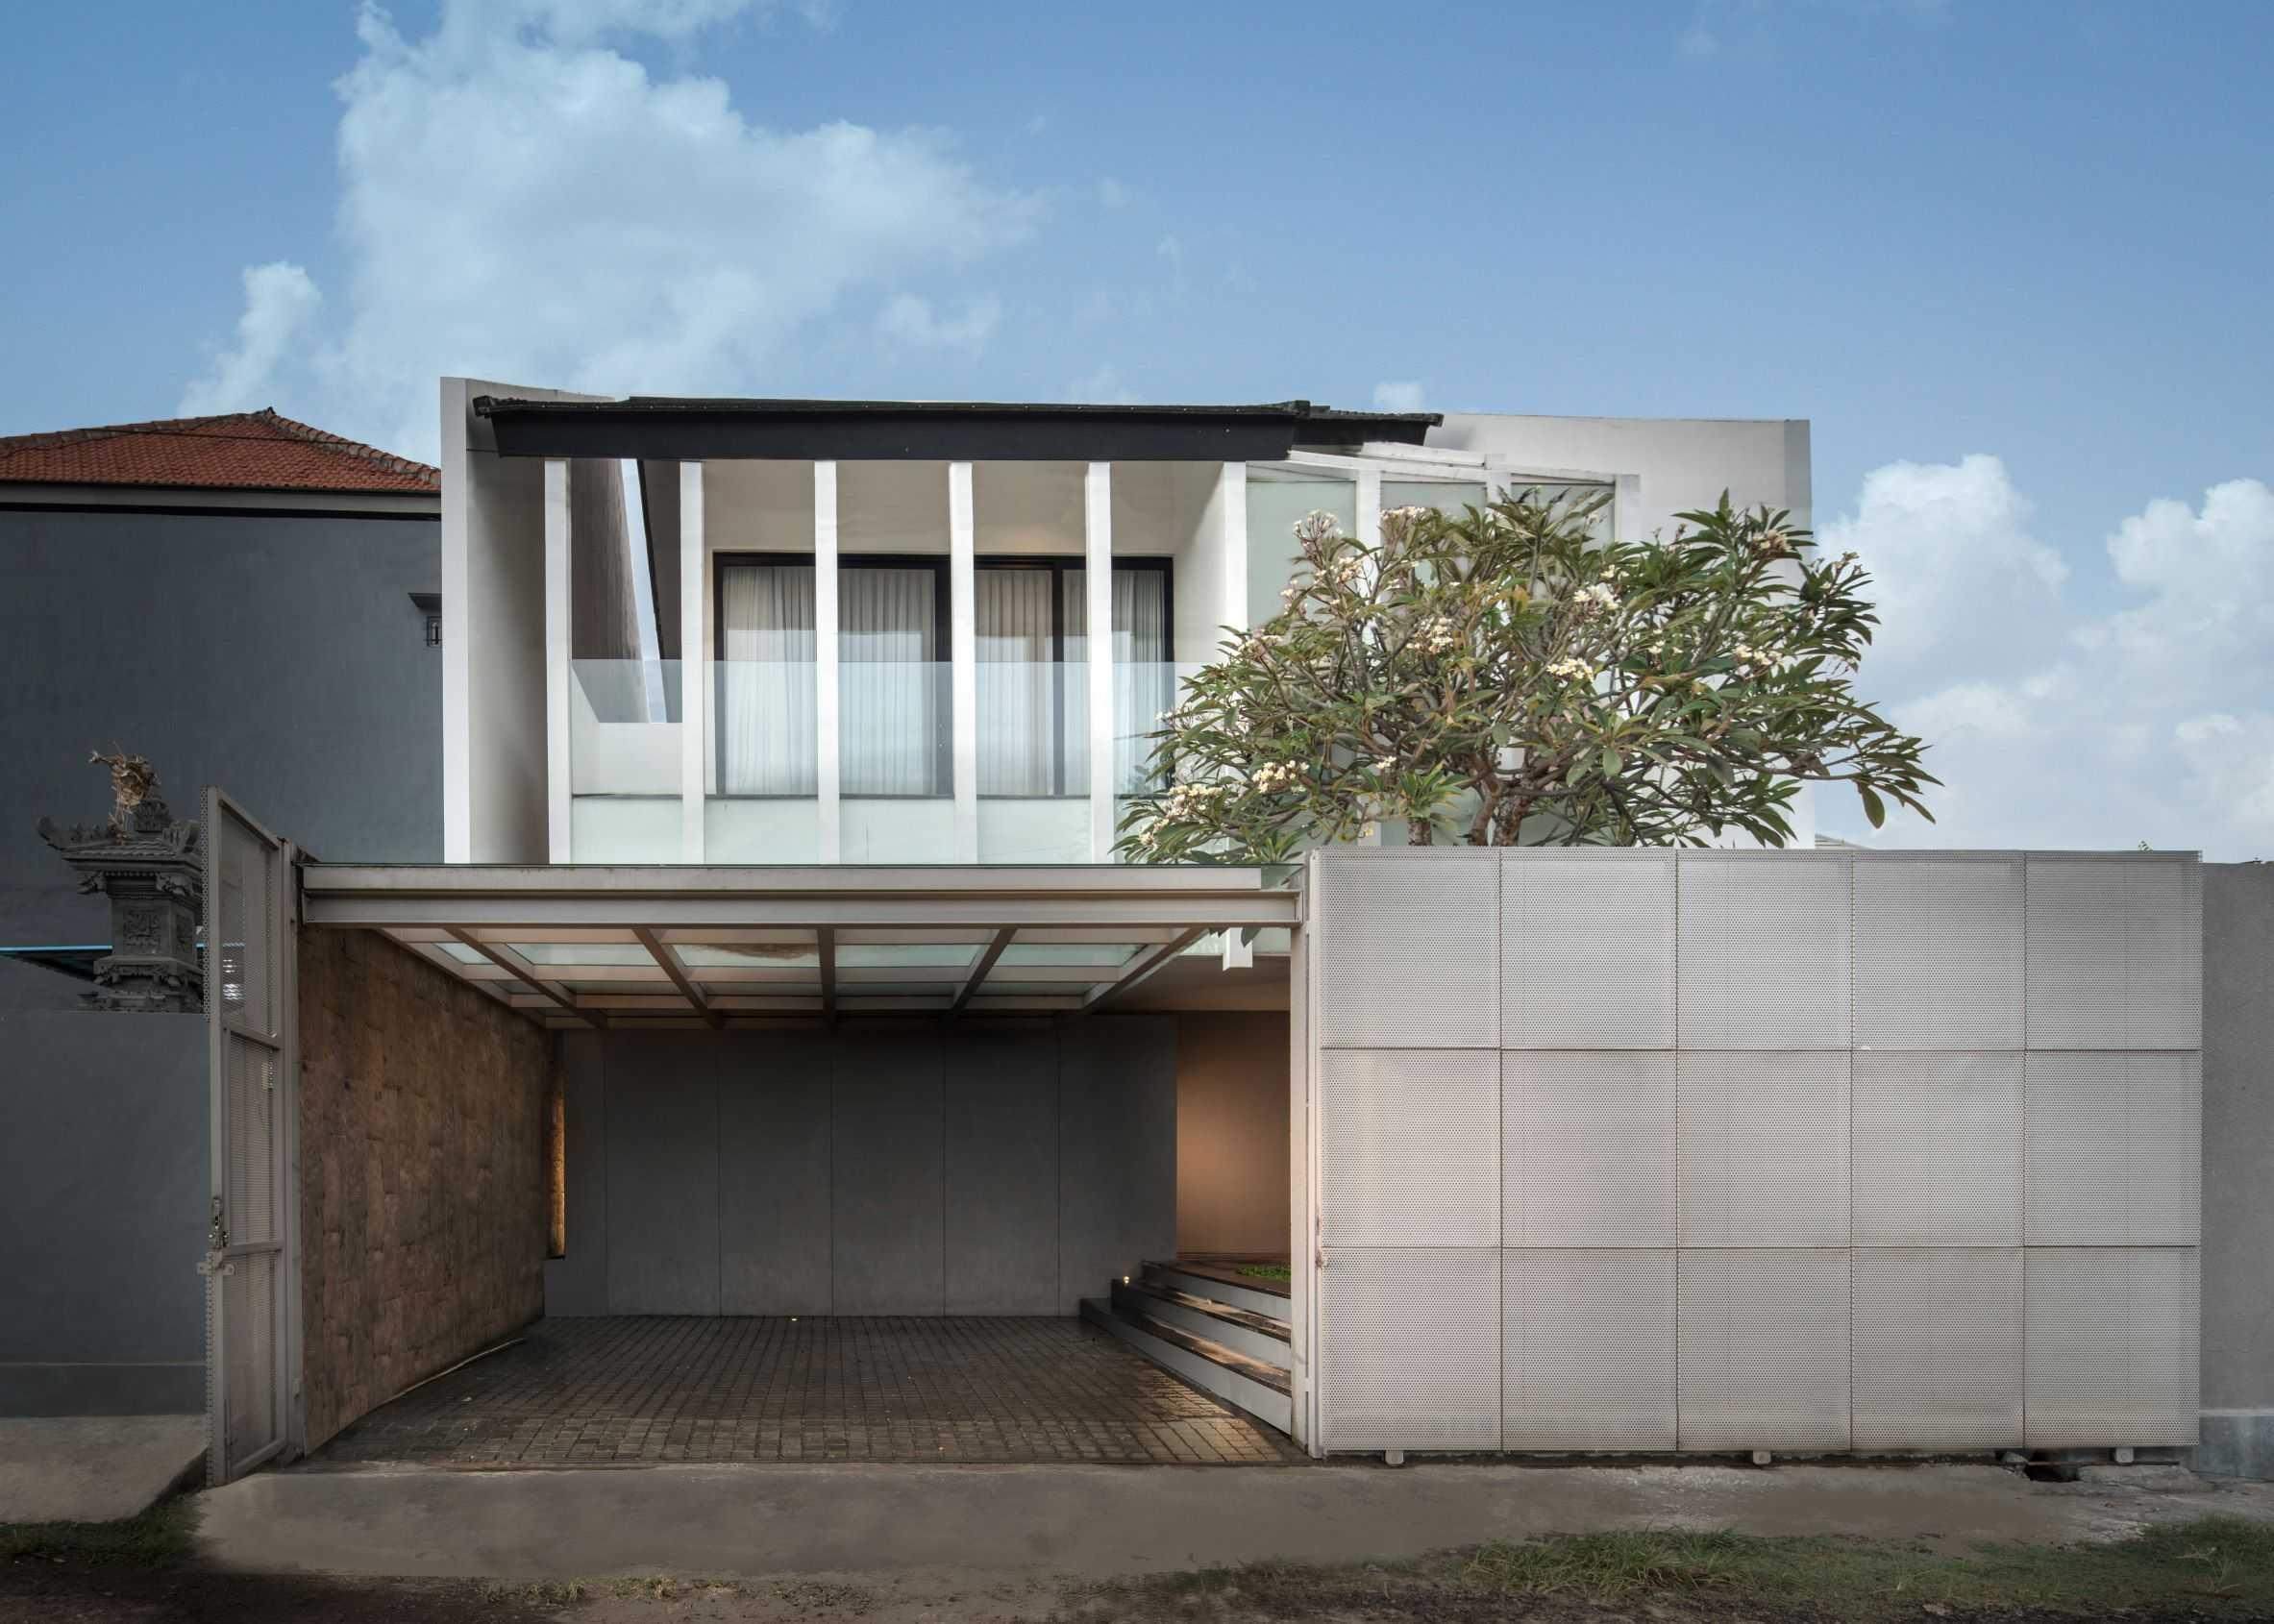 Hadivincent Architects Yy Residence Kota Denpasar, Bali, Indonesia Kota Denpasar, Bali, Indonesia Hadivincent-Architects-Yy-House   75718